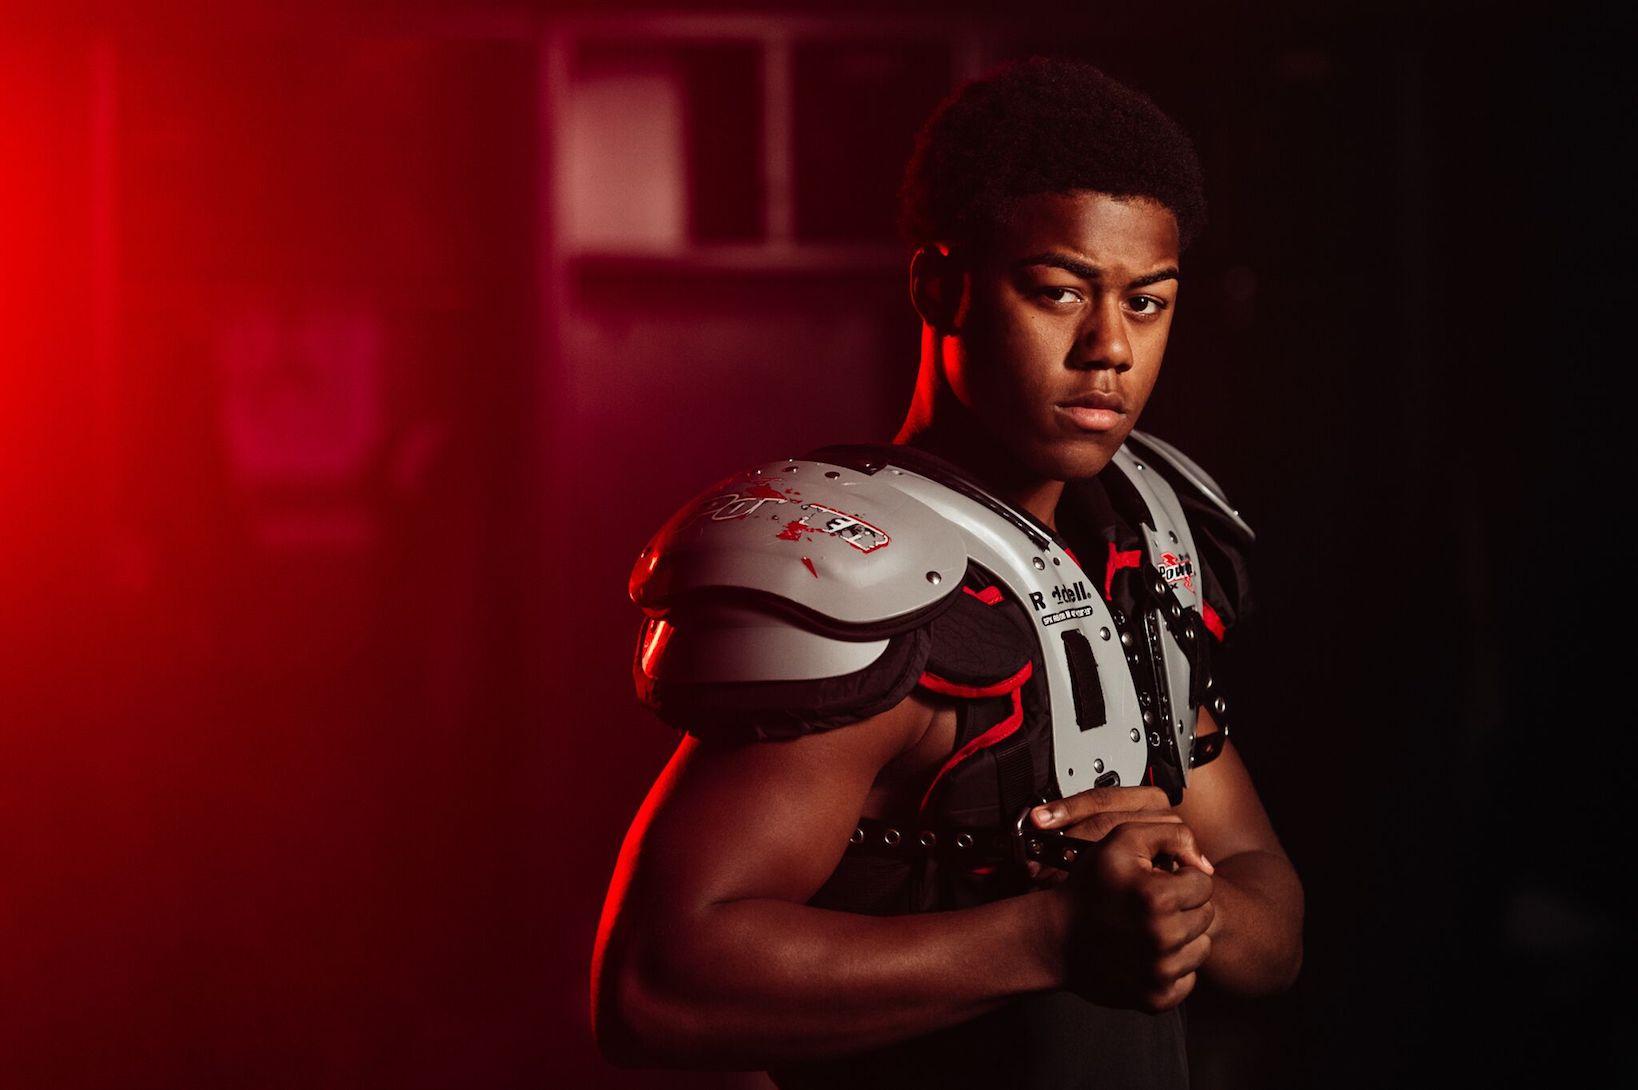 Cinematic Sports Photography by Matt Hernandez